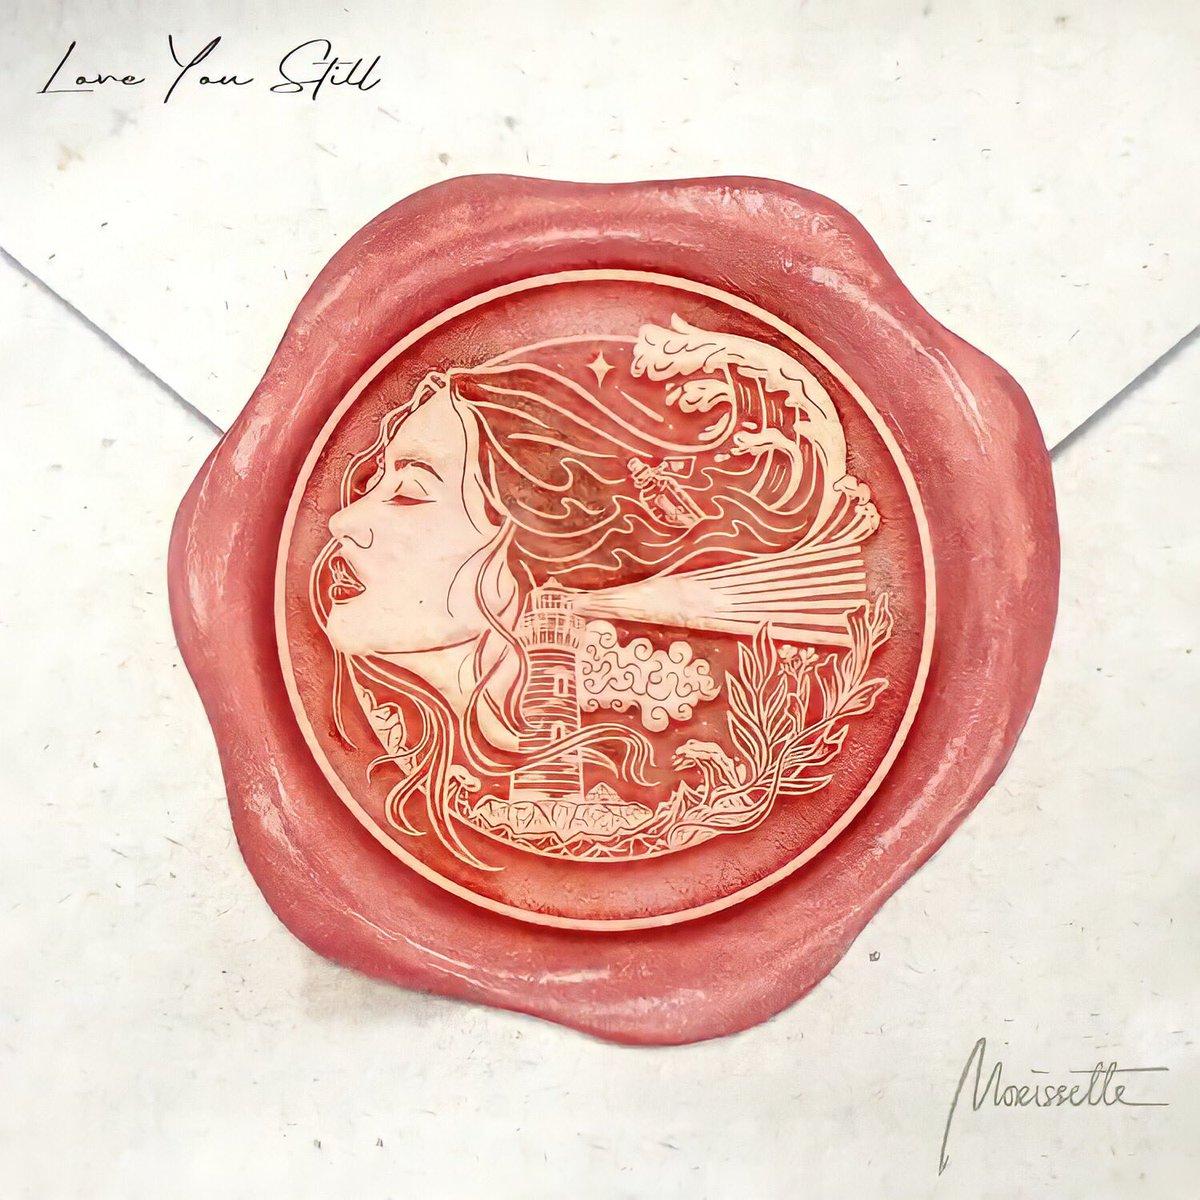 Morissette - Love You Still Lyrics